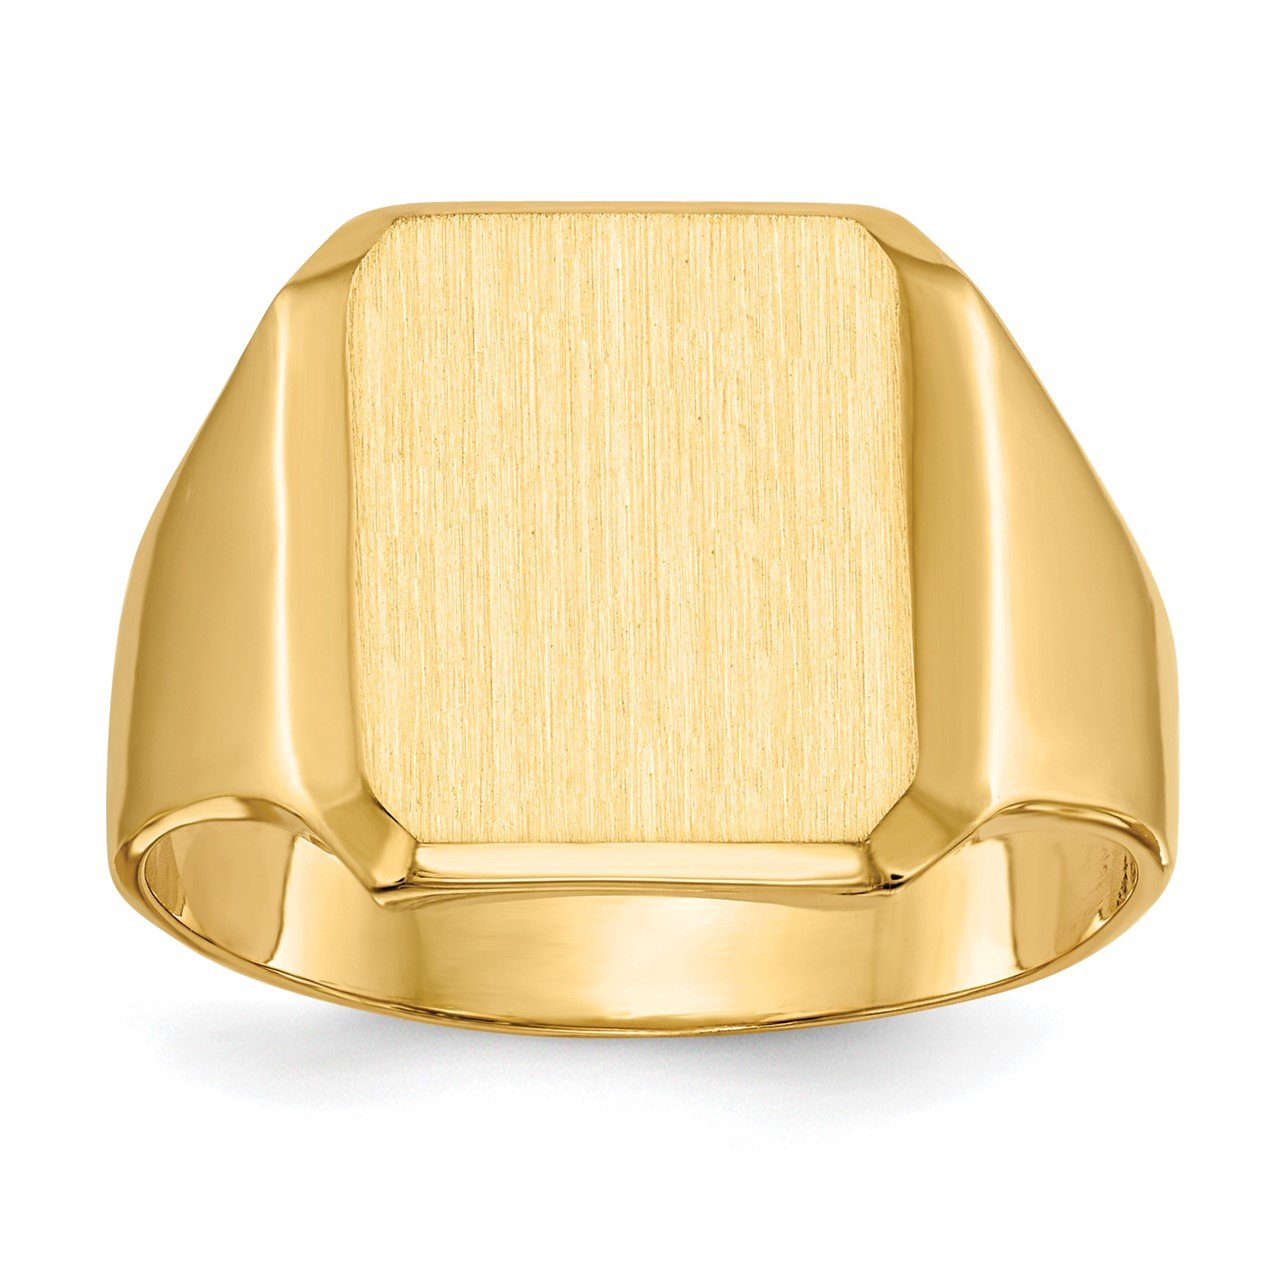 14k 15.0x12.5mm Closed Back Men's Signet Ring